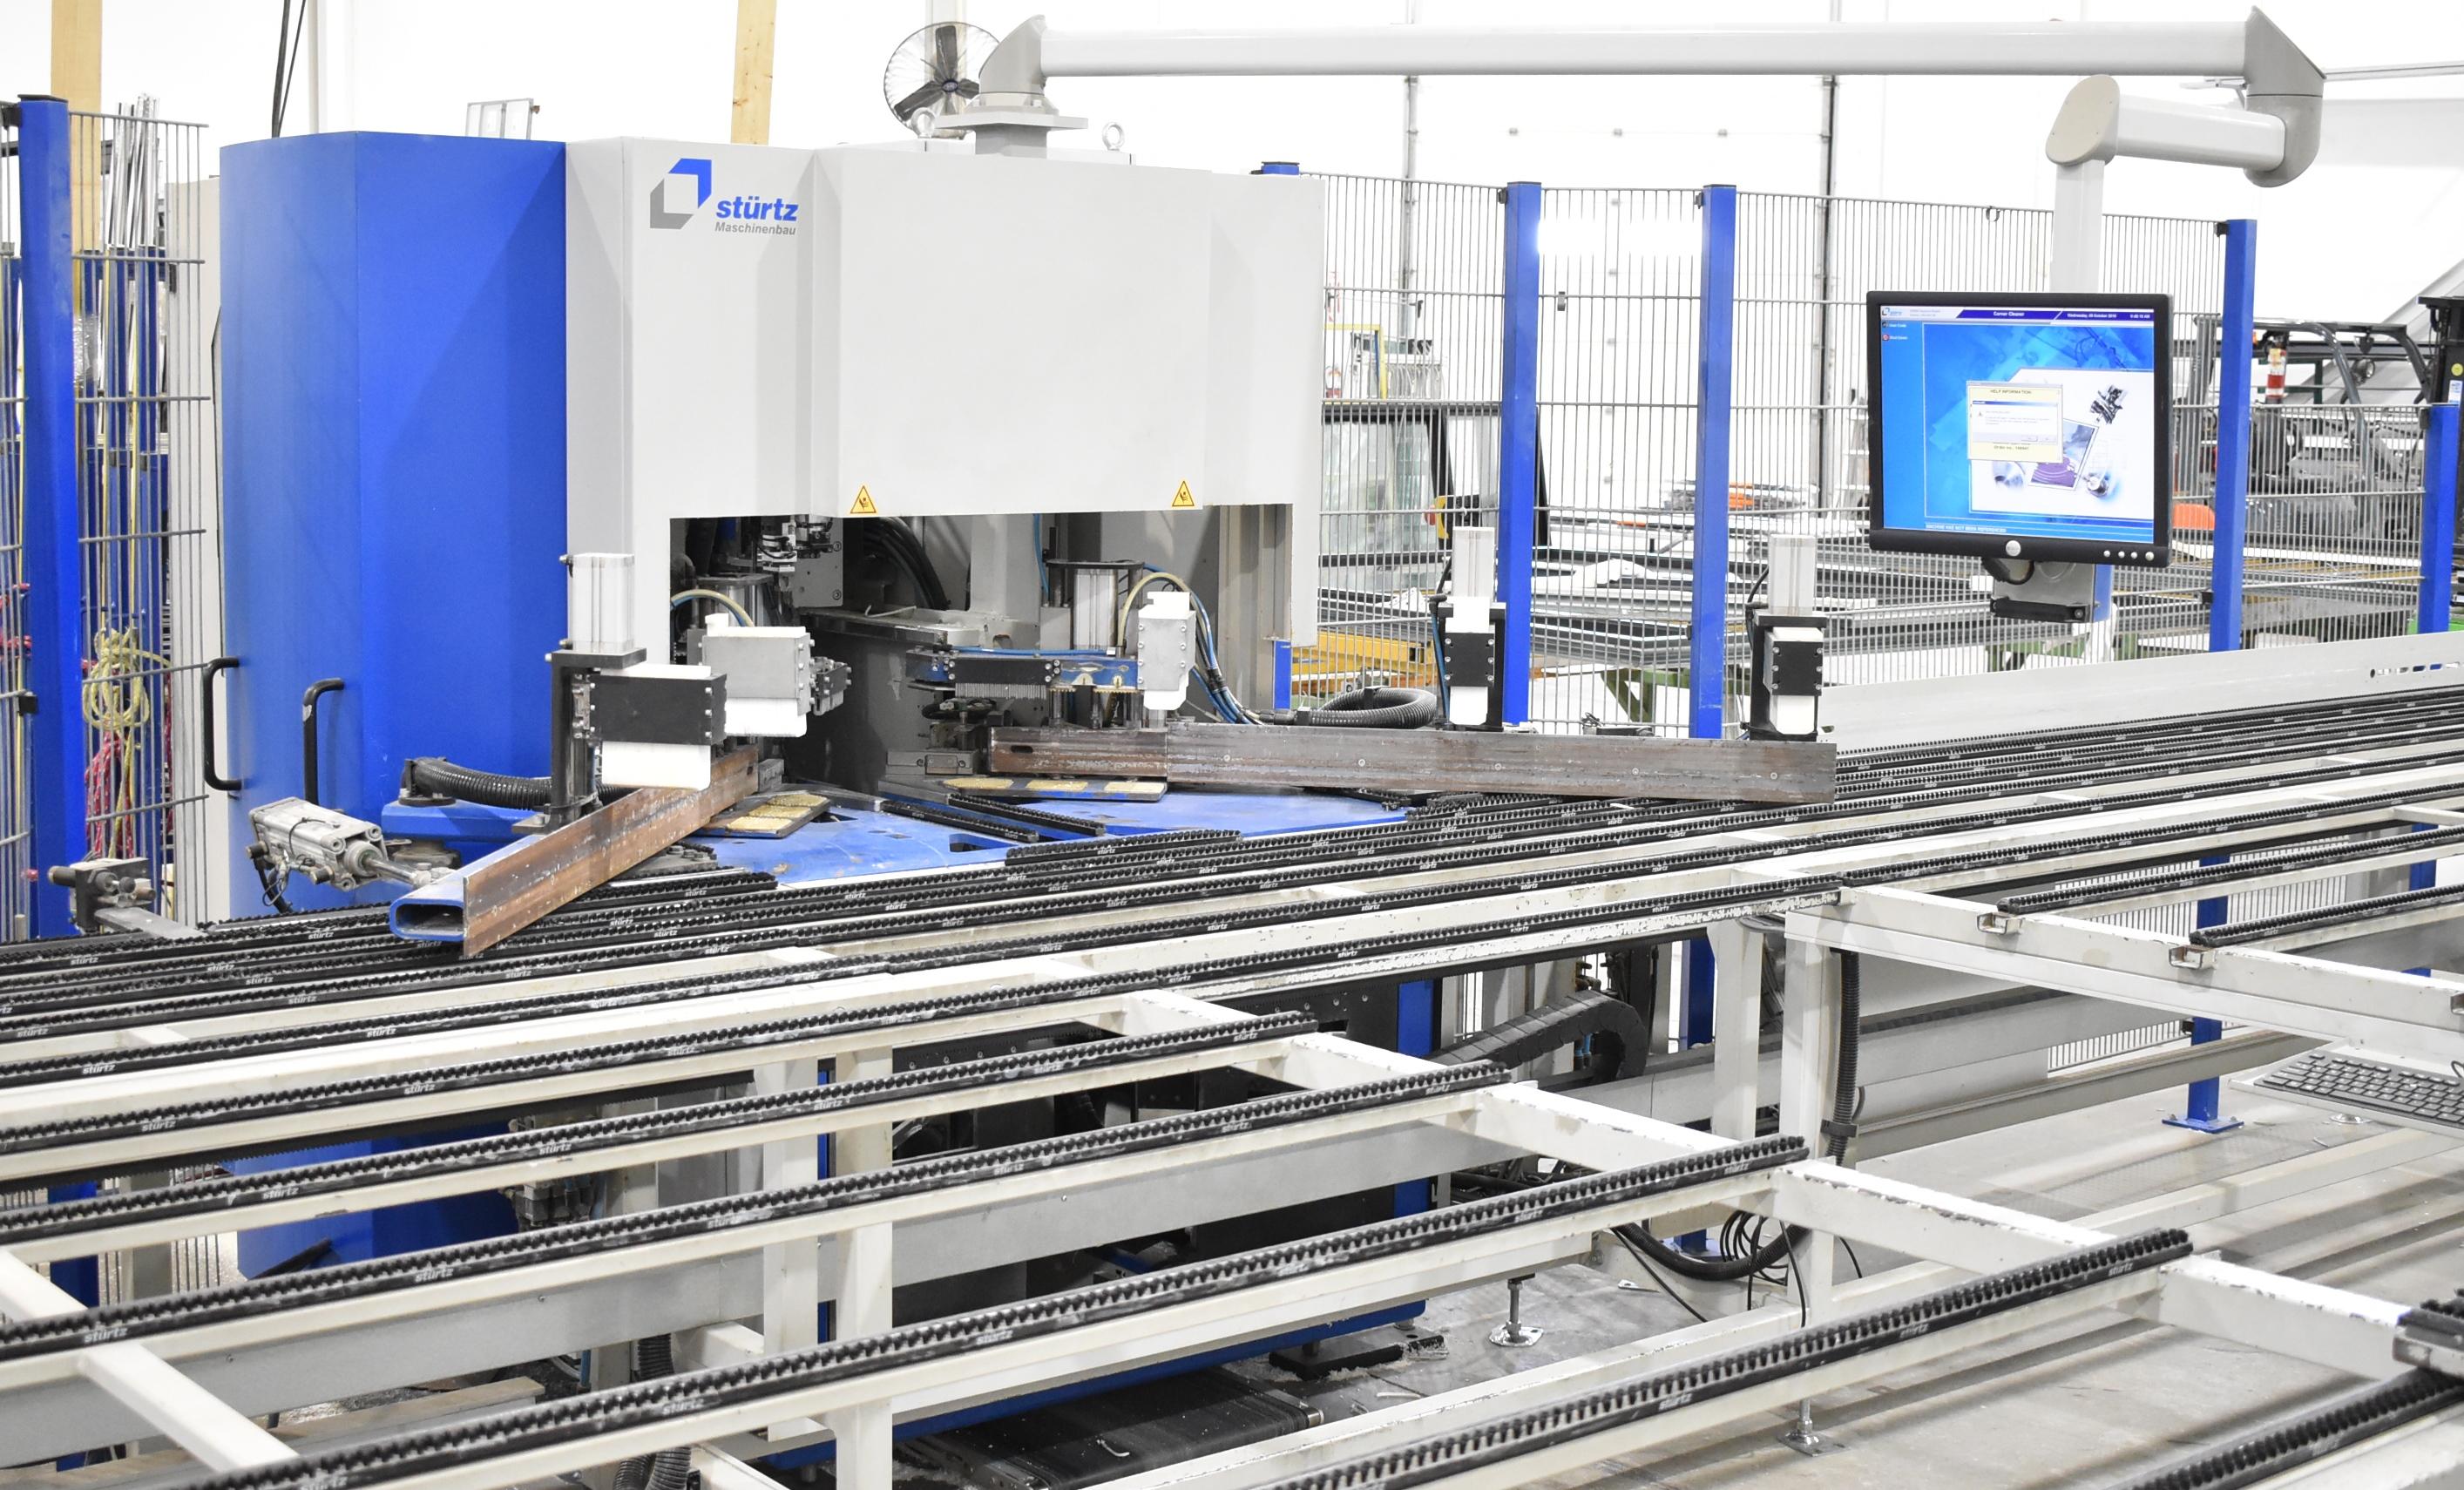 STURTZ (2008) CNC AUTOMATED PVC WELDING AND CLEANING LINE CONSISTING OF, STURTZ (2008) 2MC CNC - Image 2 of 9